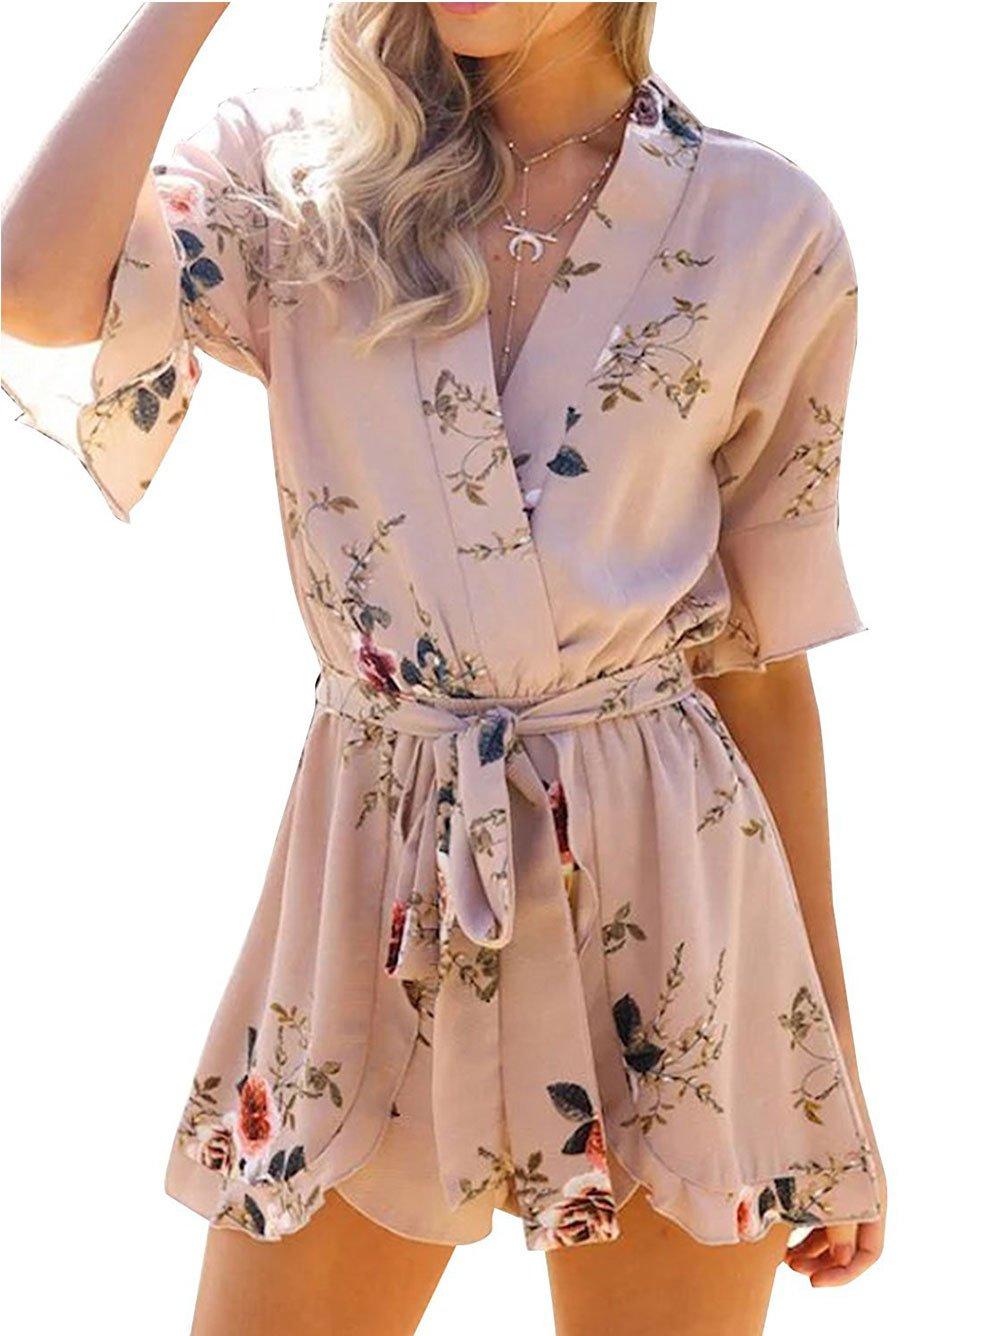 Famulily Women's Boho Floral Print Flare Sleeve Tie Waist Romper Jumpsuit Beachwear